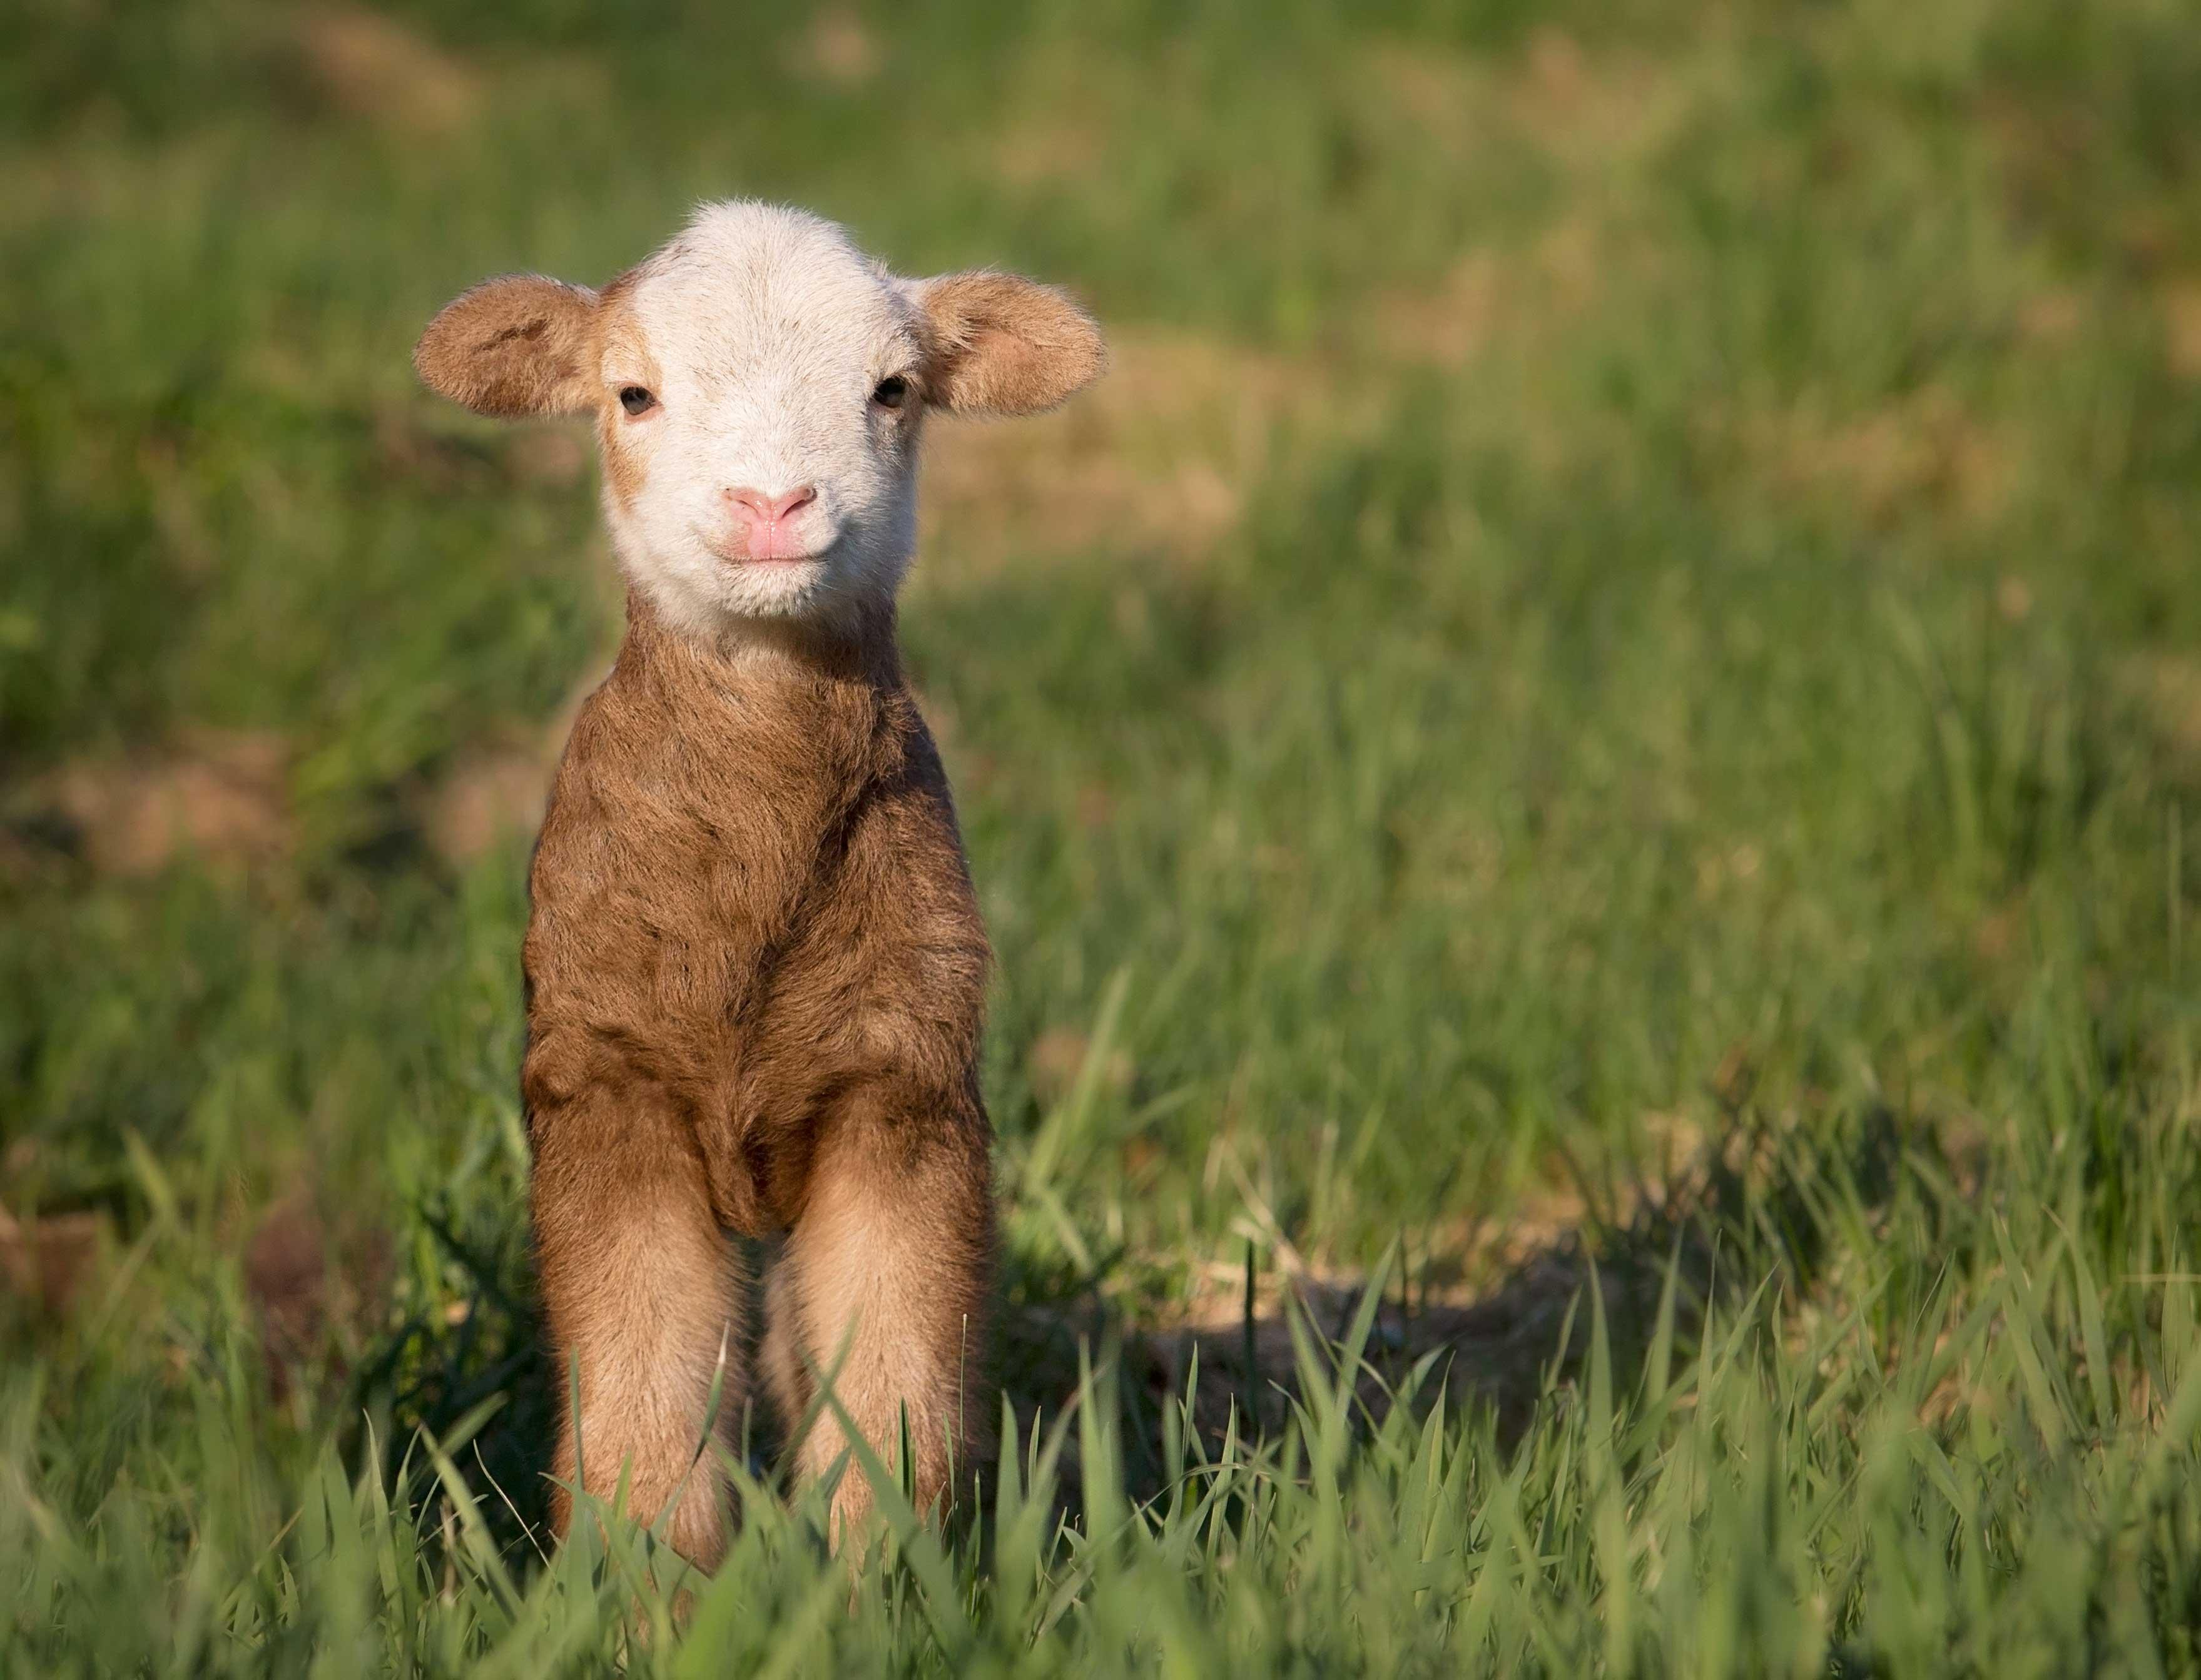 Managing Intestinal Parasites in Sheep